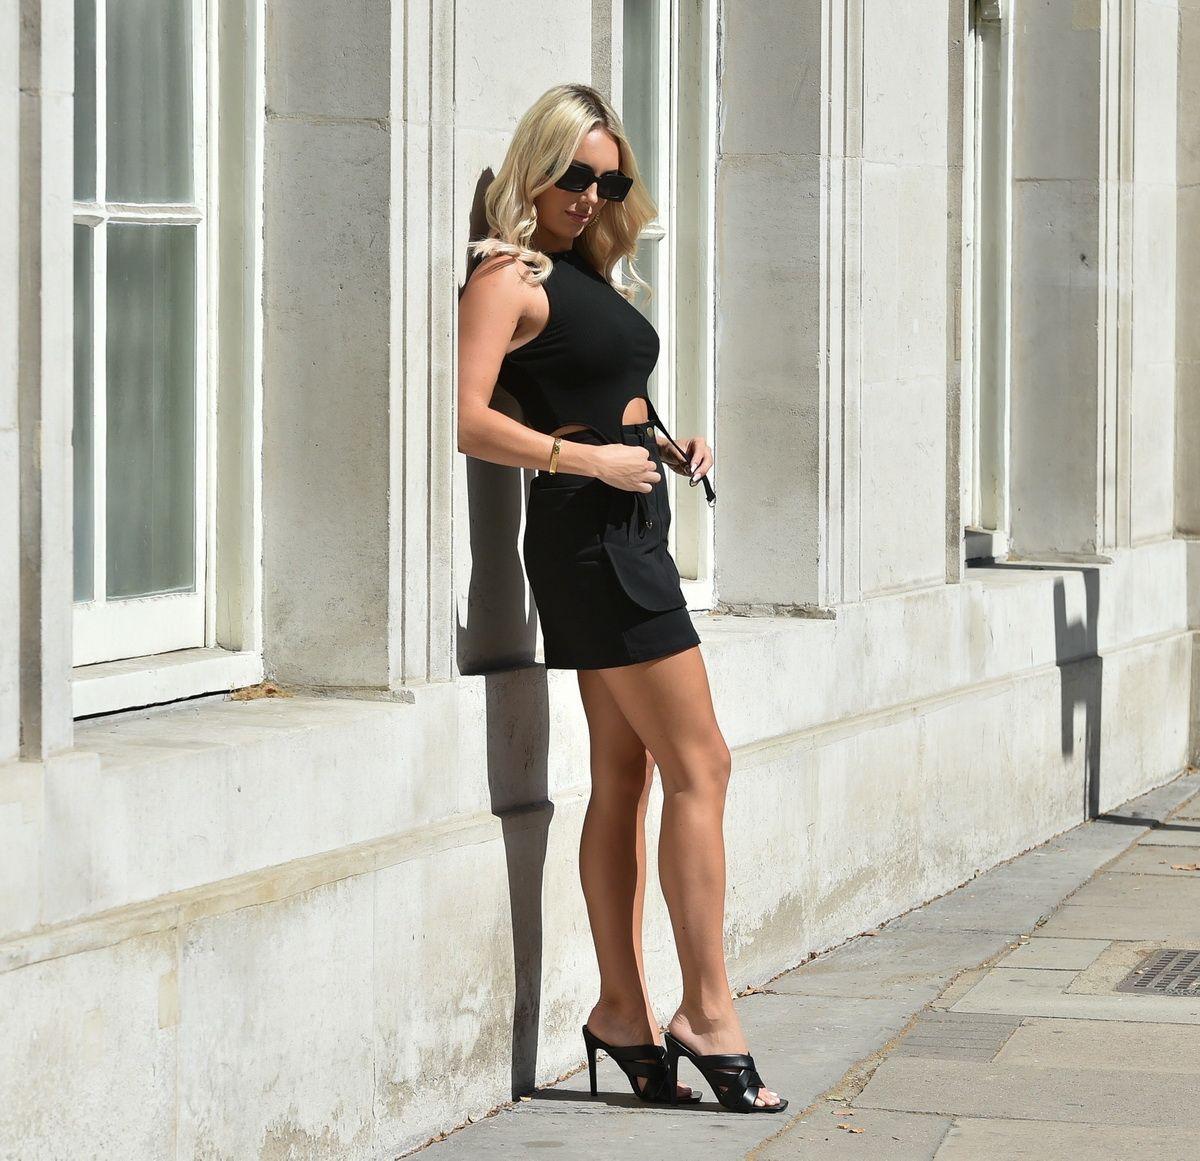 Amber Turner Boohoo Photoshoot London